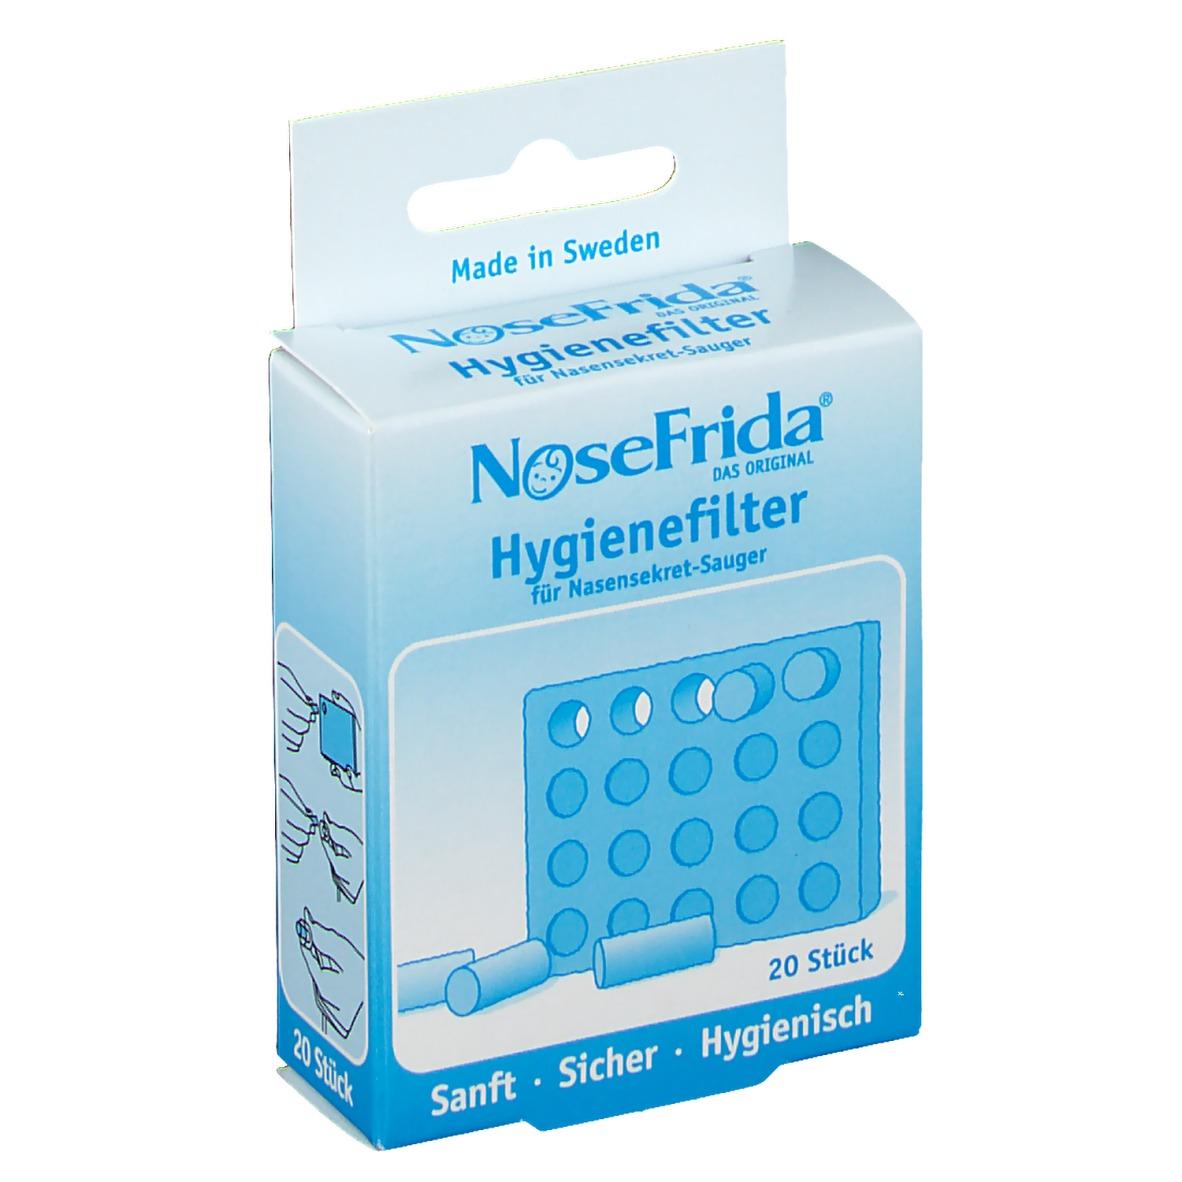 20 Ersatzfilter für Nose Frida Baby Nasensauger Nosefrida